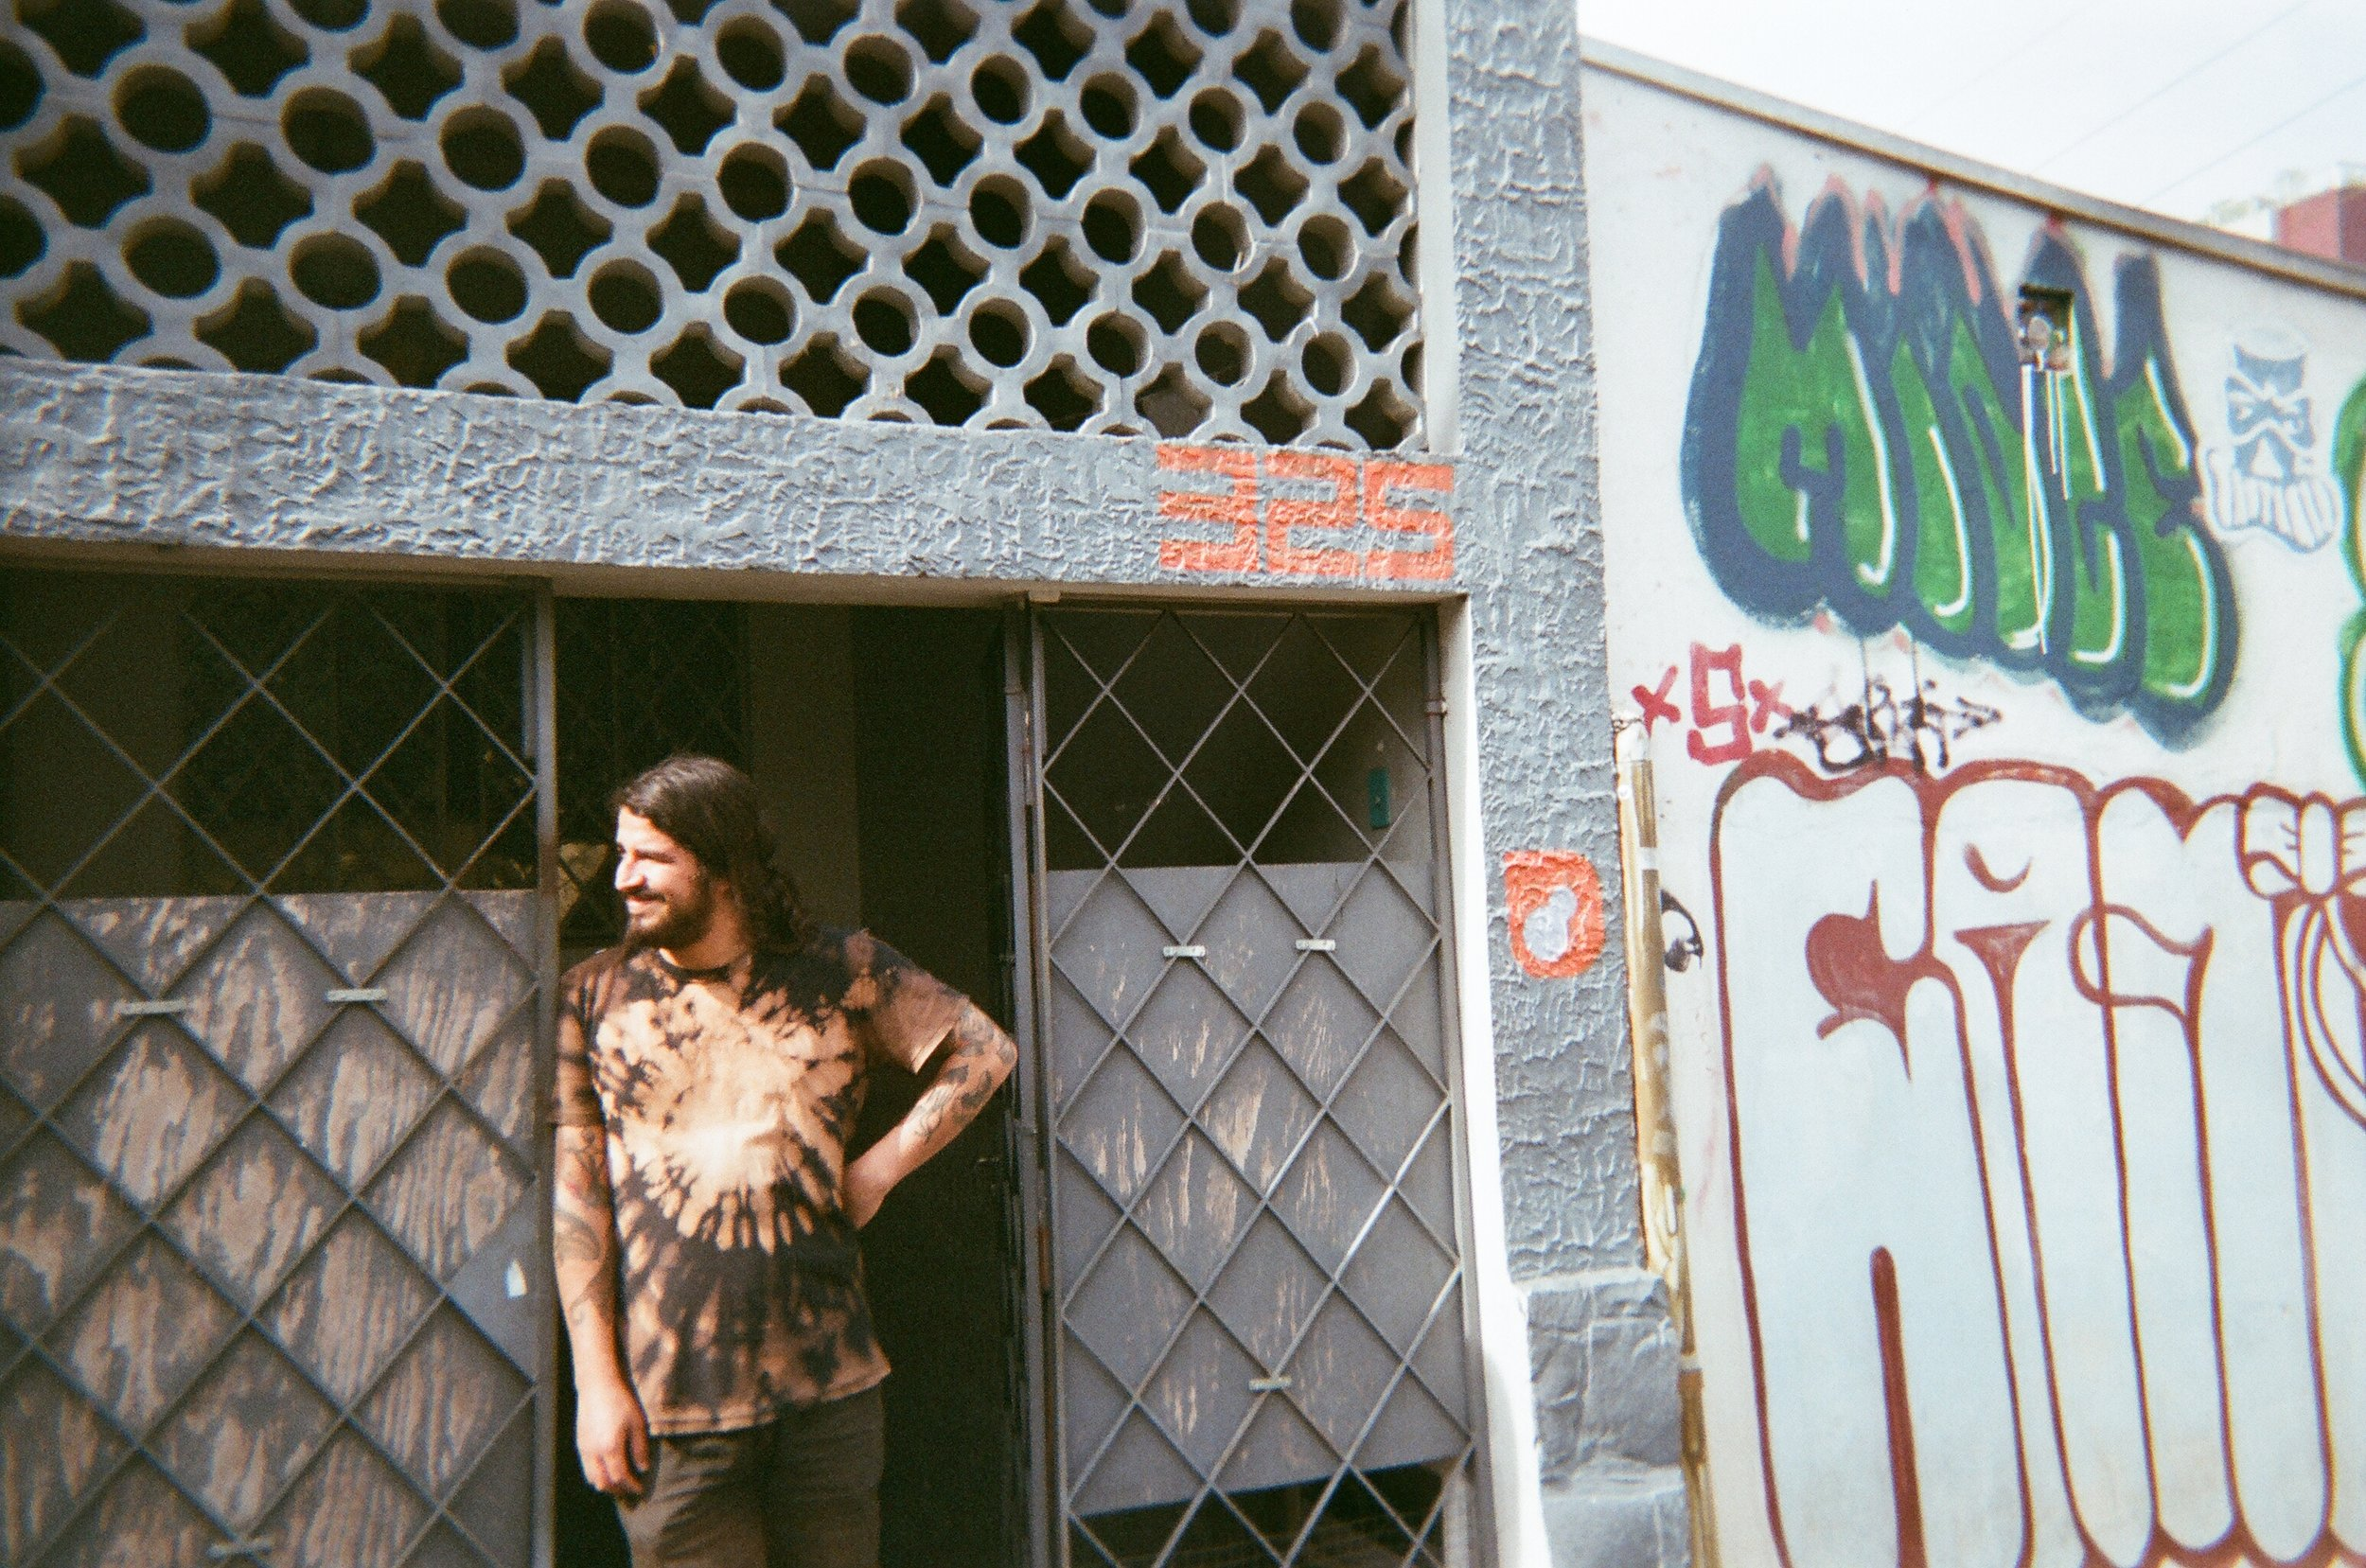 Xau in front of Lavanderia • Curitiba, Brazil • Photo by Kent Irwin